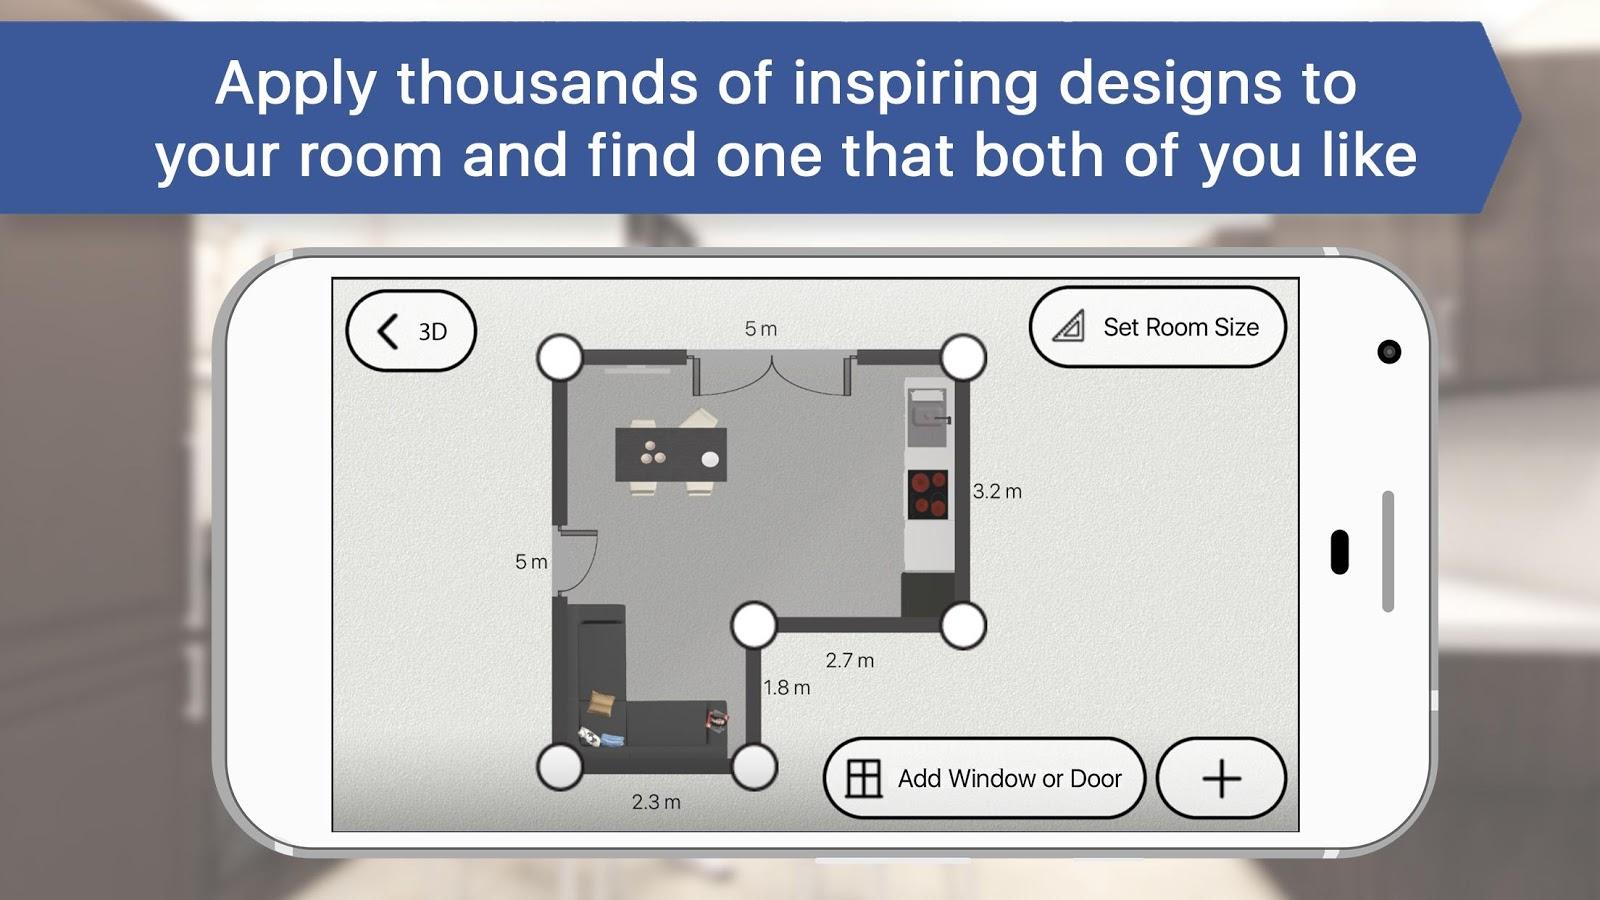 icandesign for ikea home interior room planner android apps icandesign for ikea home interior room planner screenshot